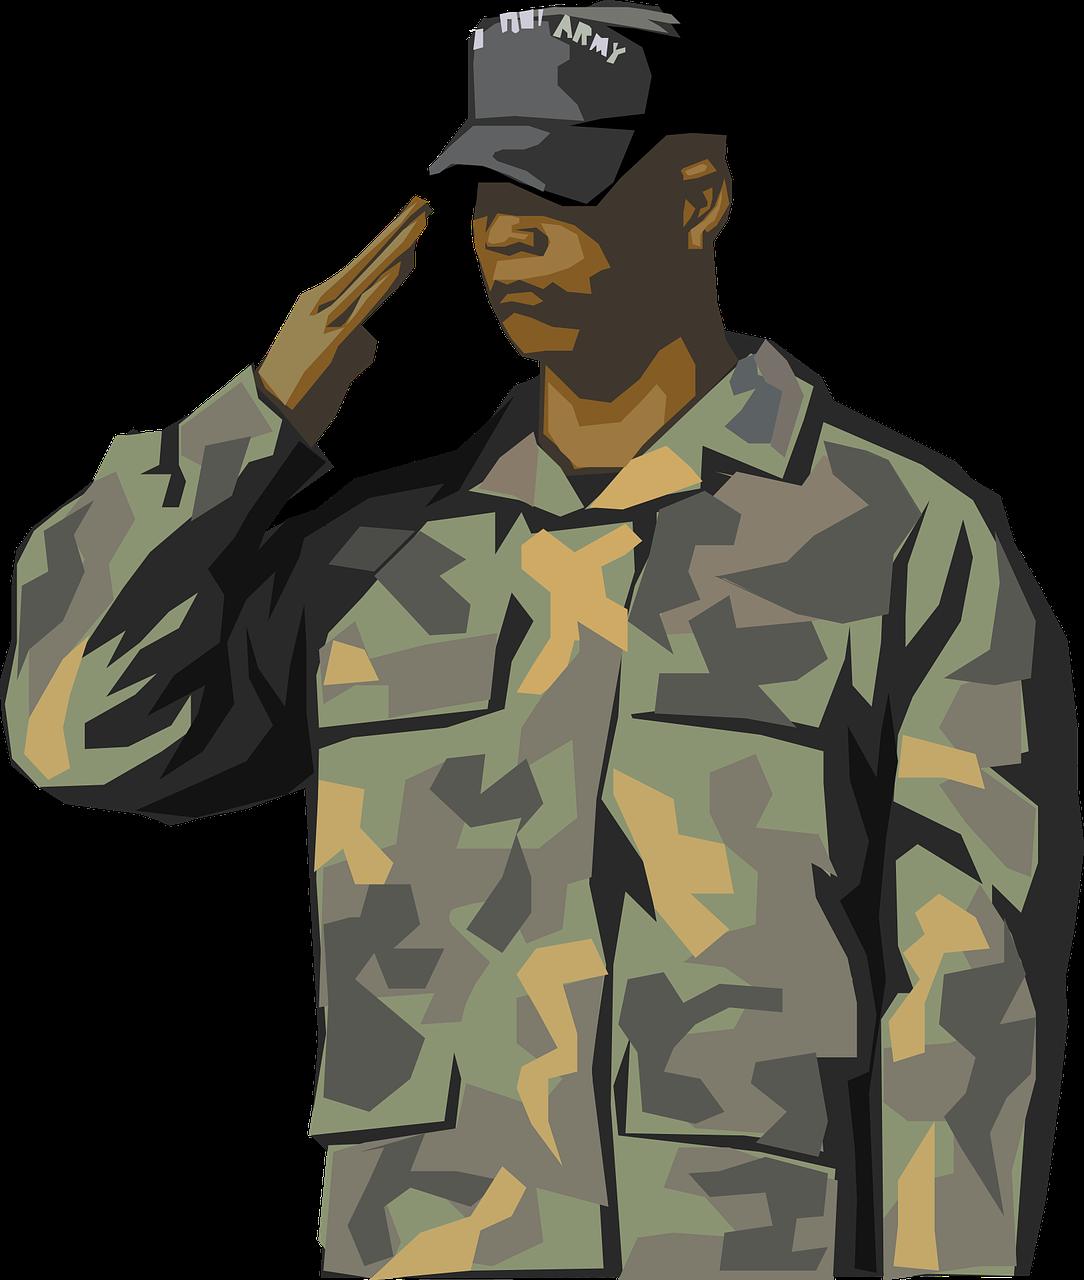 חייל מצדיע